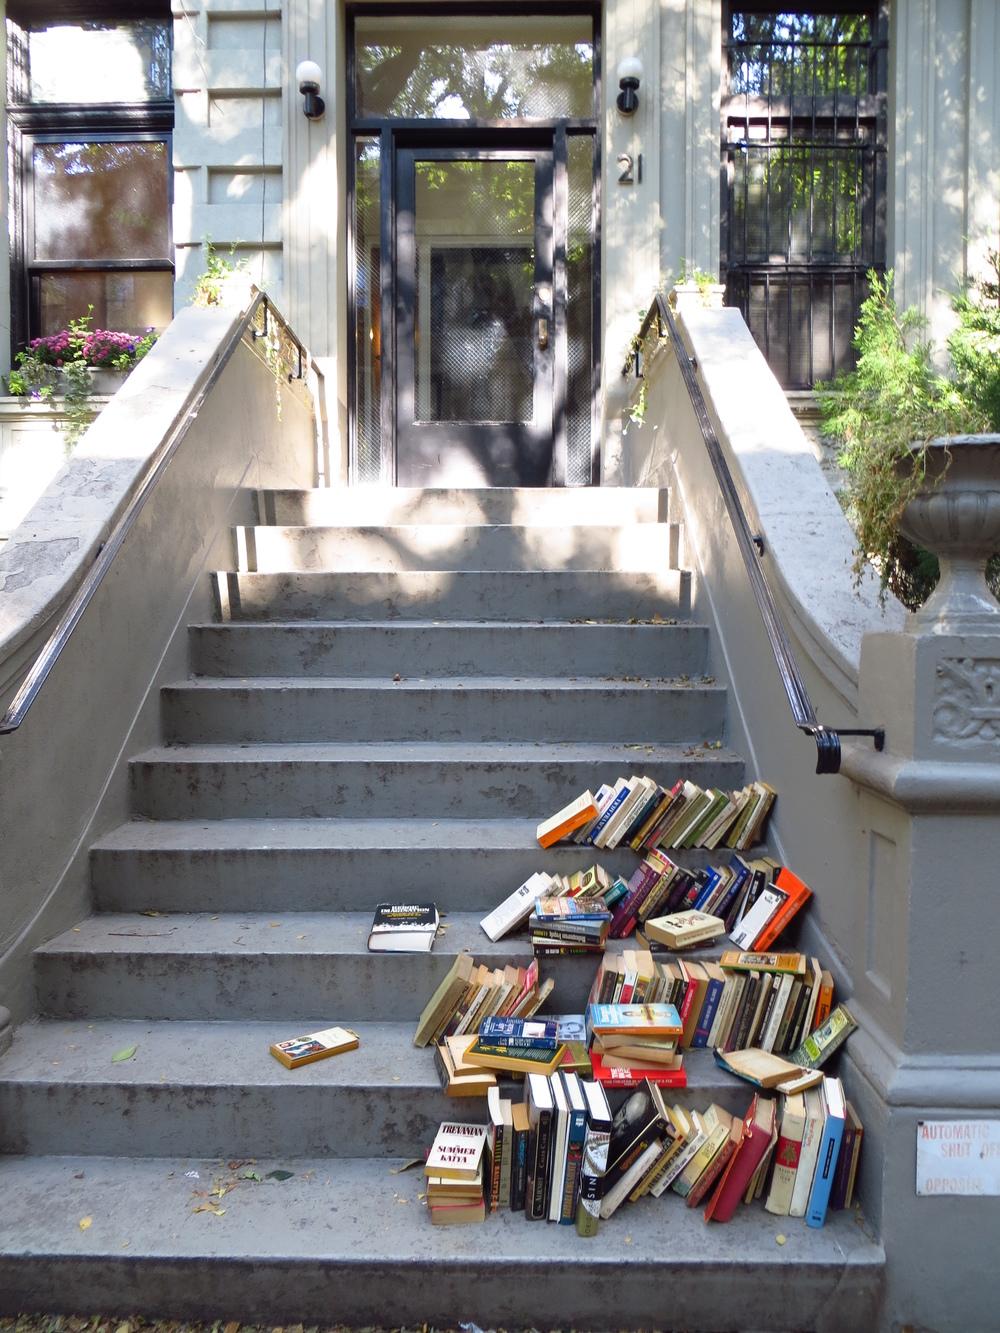 Free(?) books